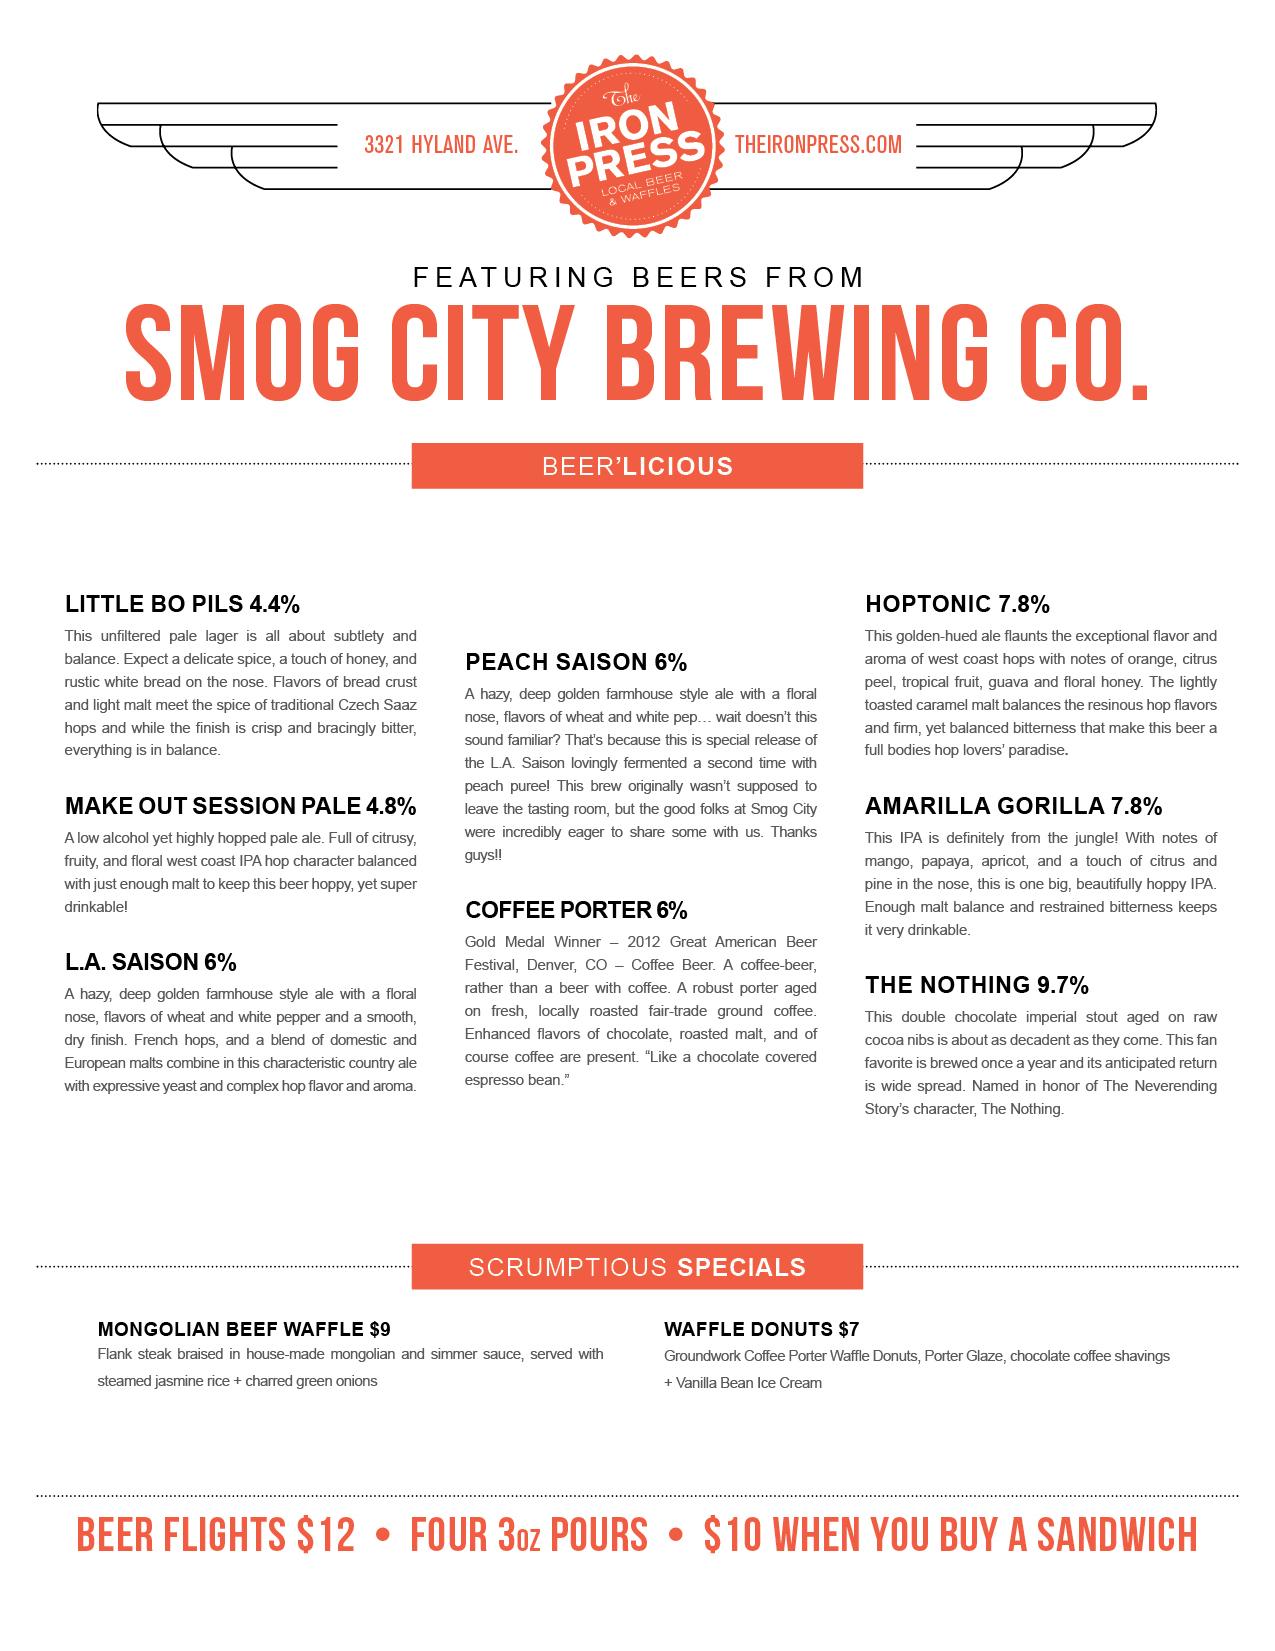 Smog City Brewing x The Iron Press